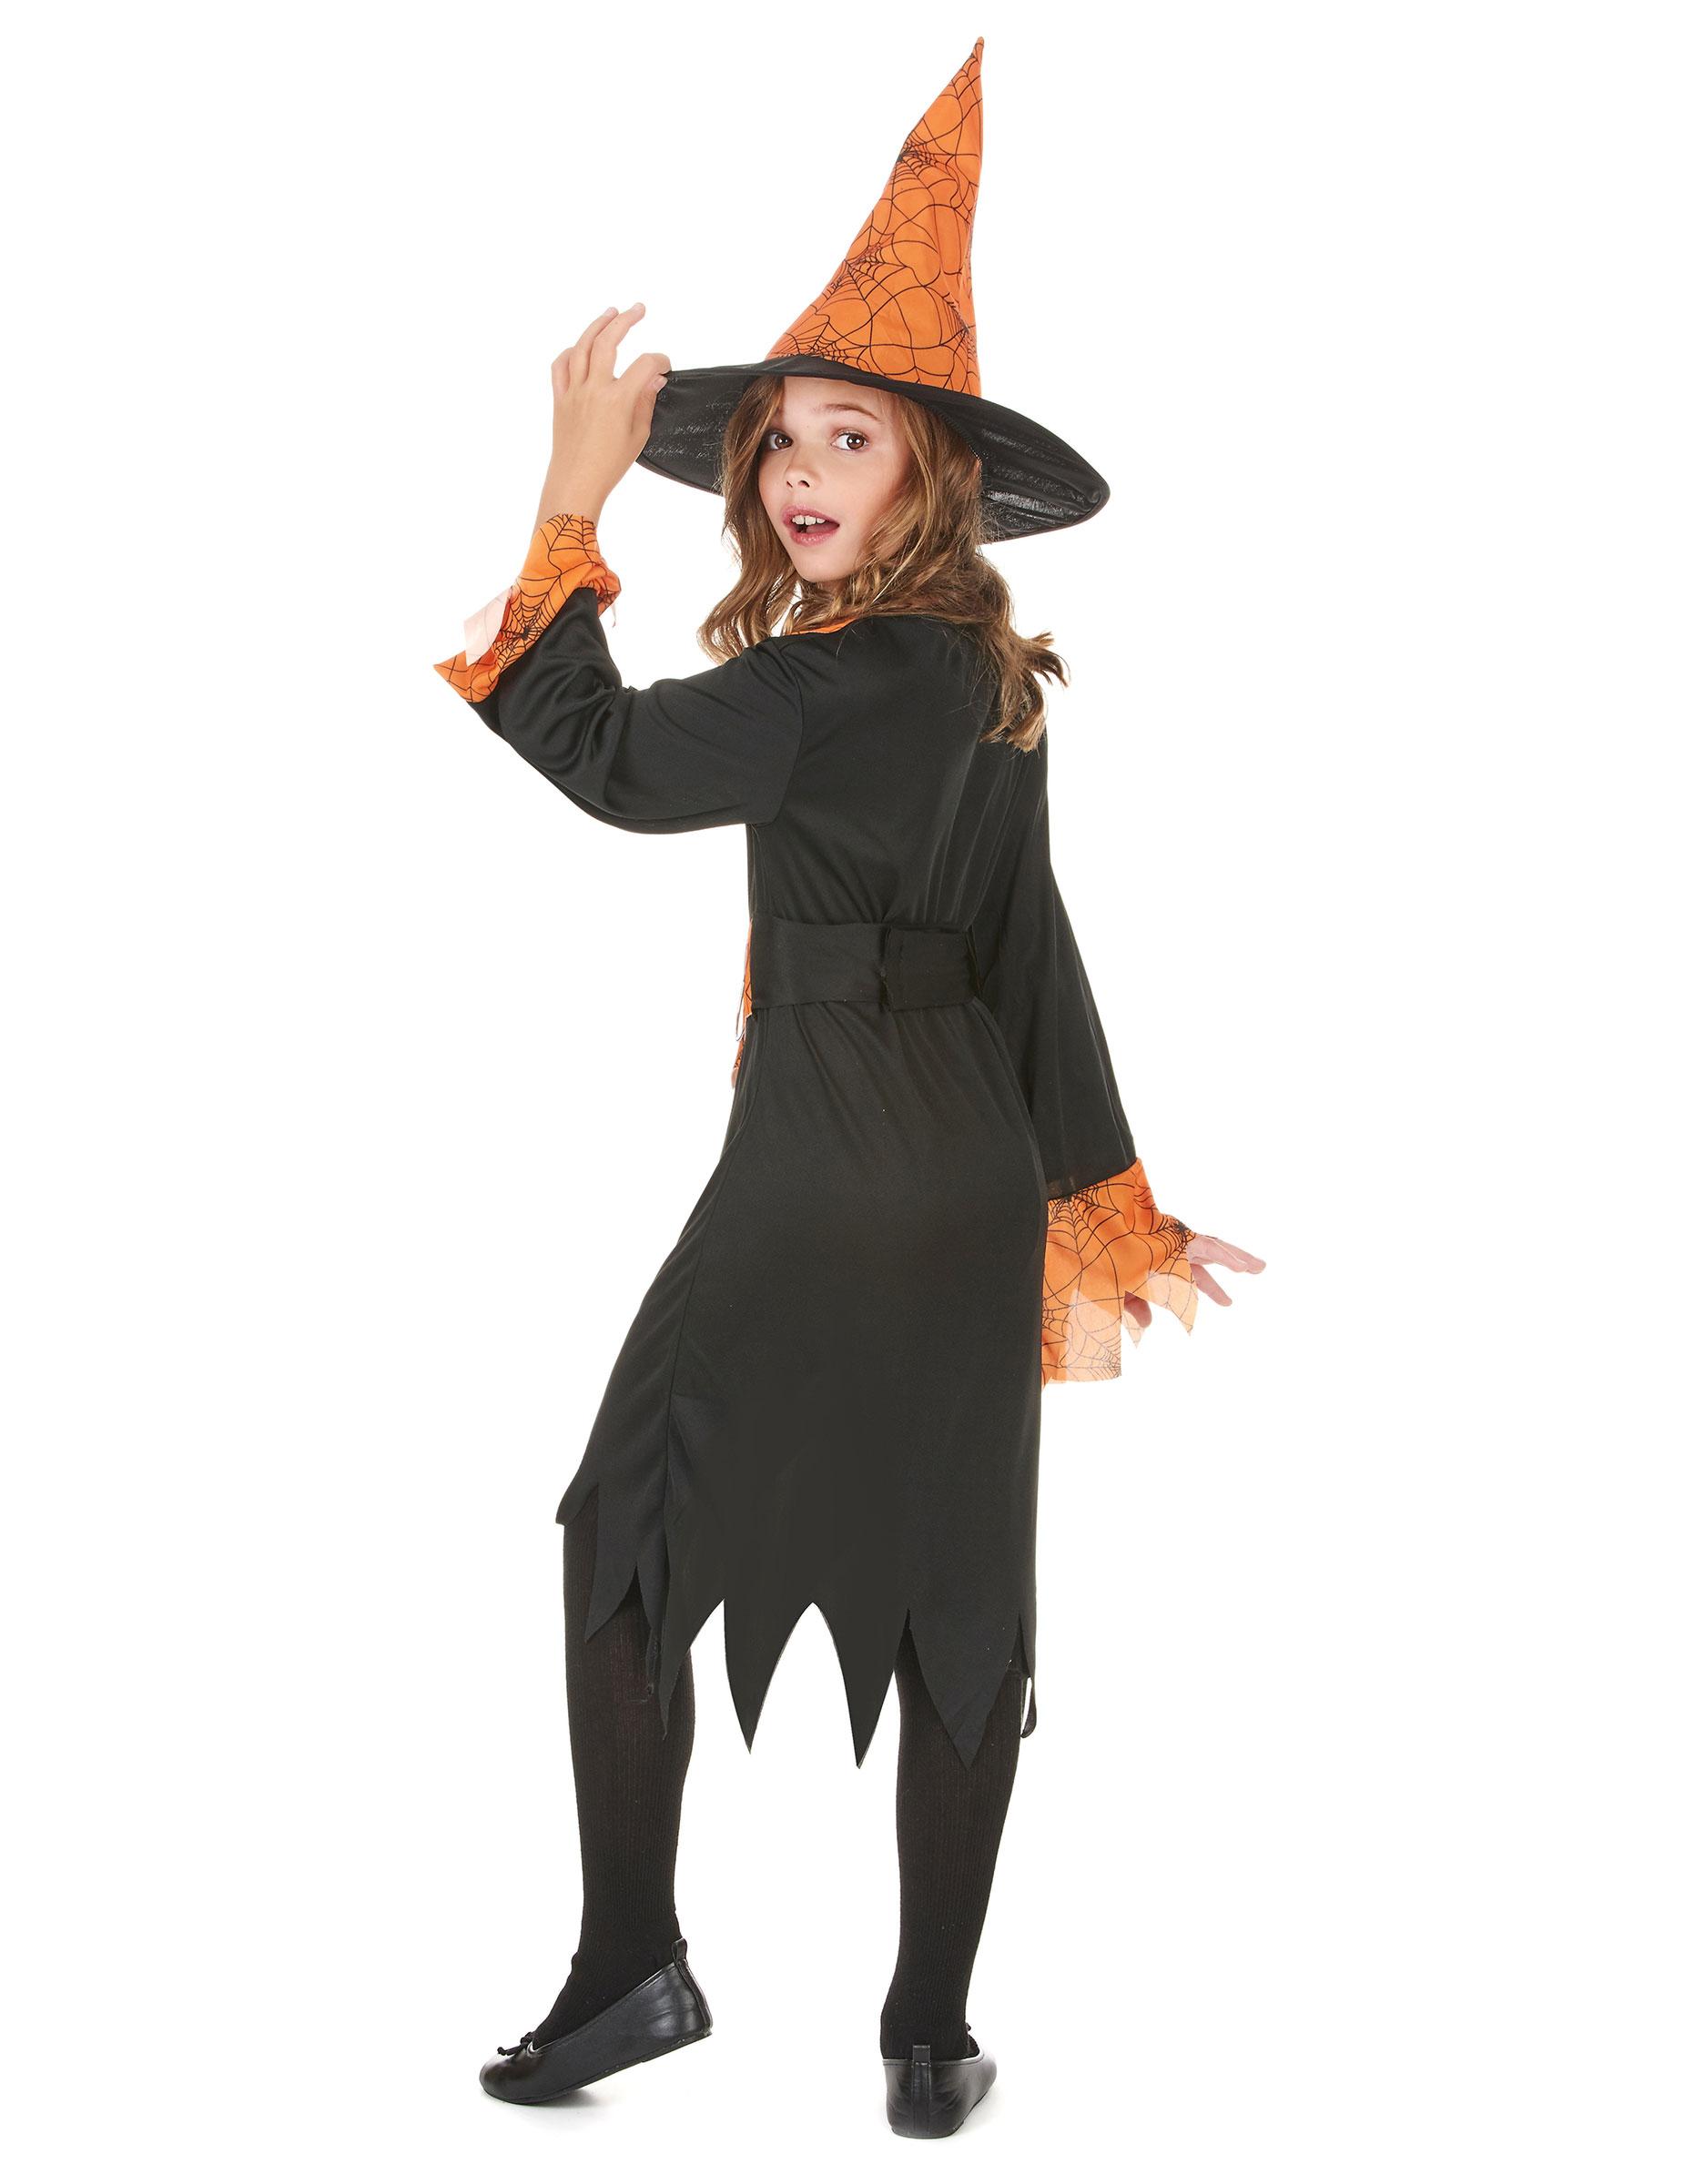 075c868a0415 Costume da strega nero e arancione bambina Halloween-2